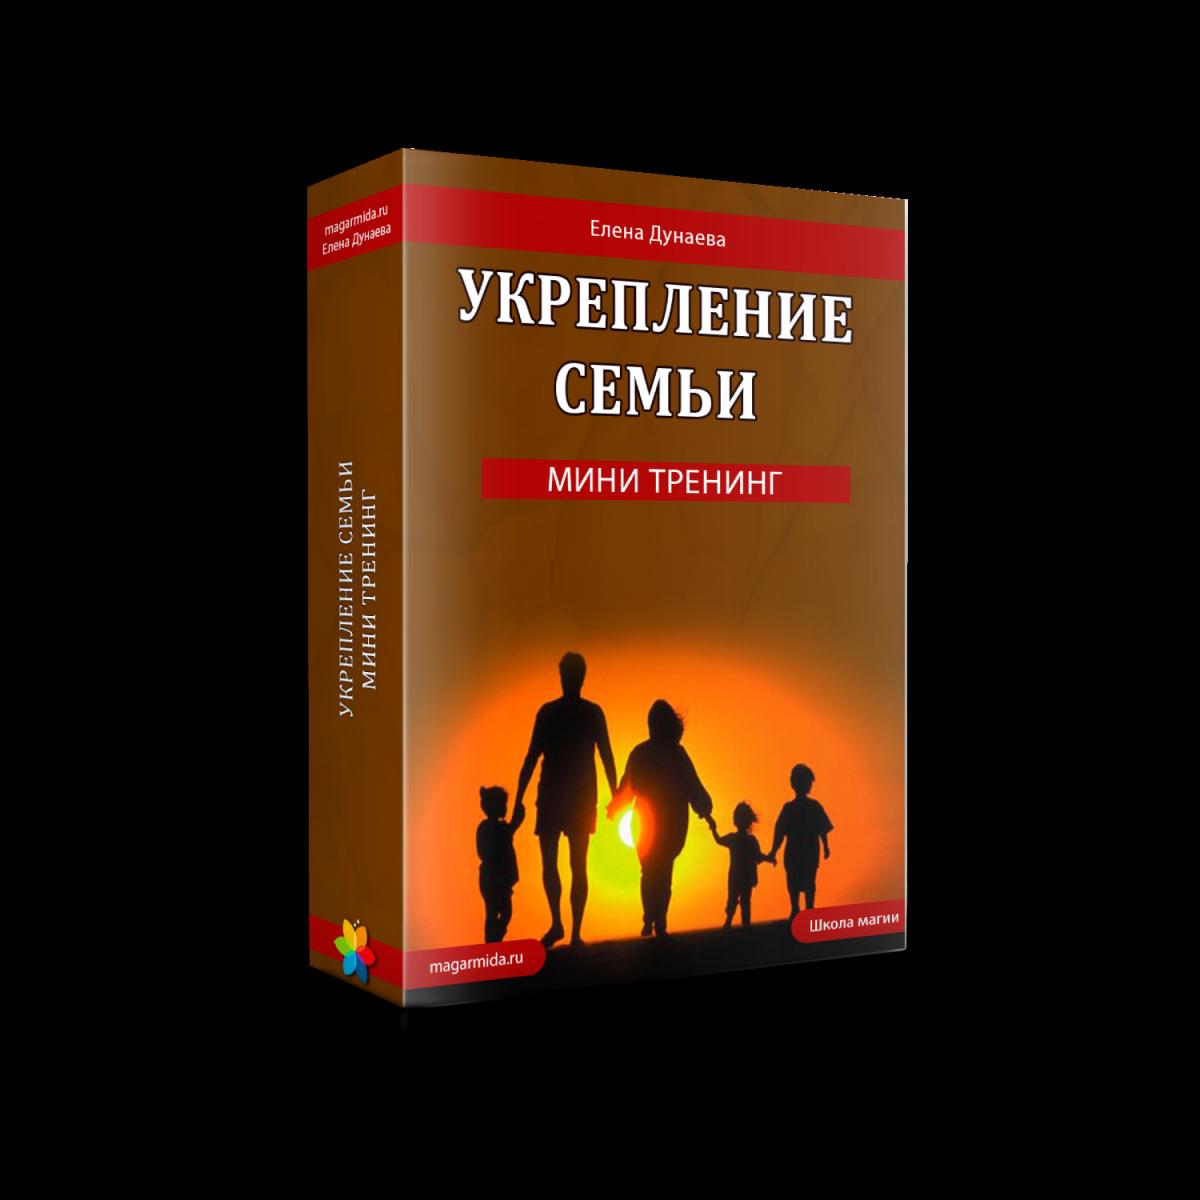 Мини-тренинг Укрепление семьи